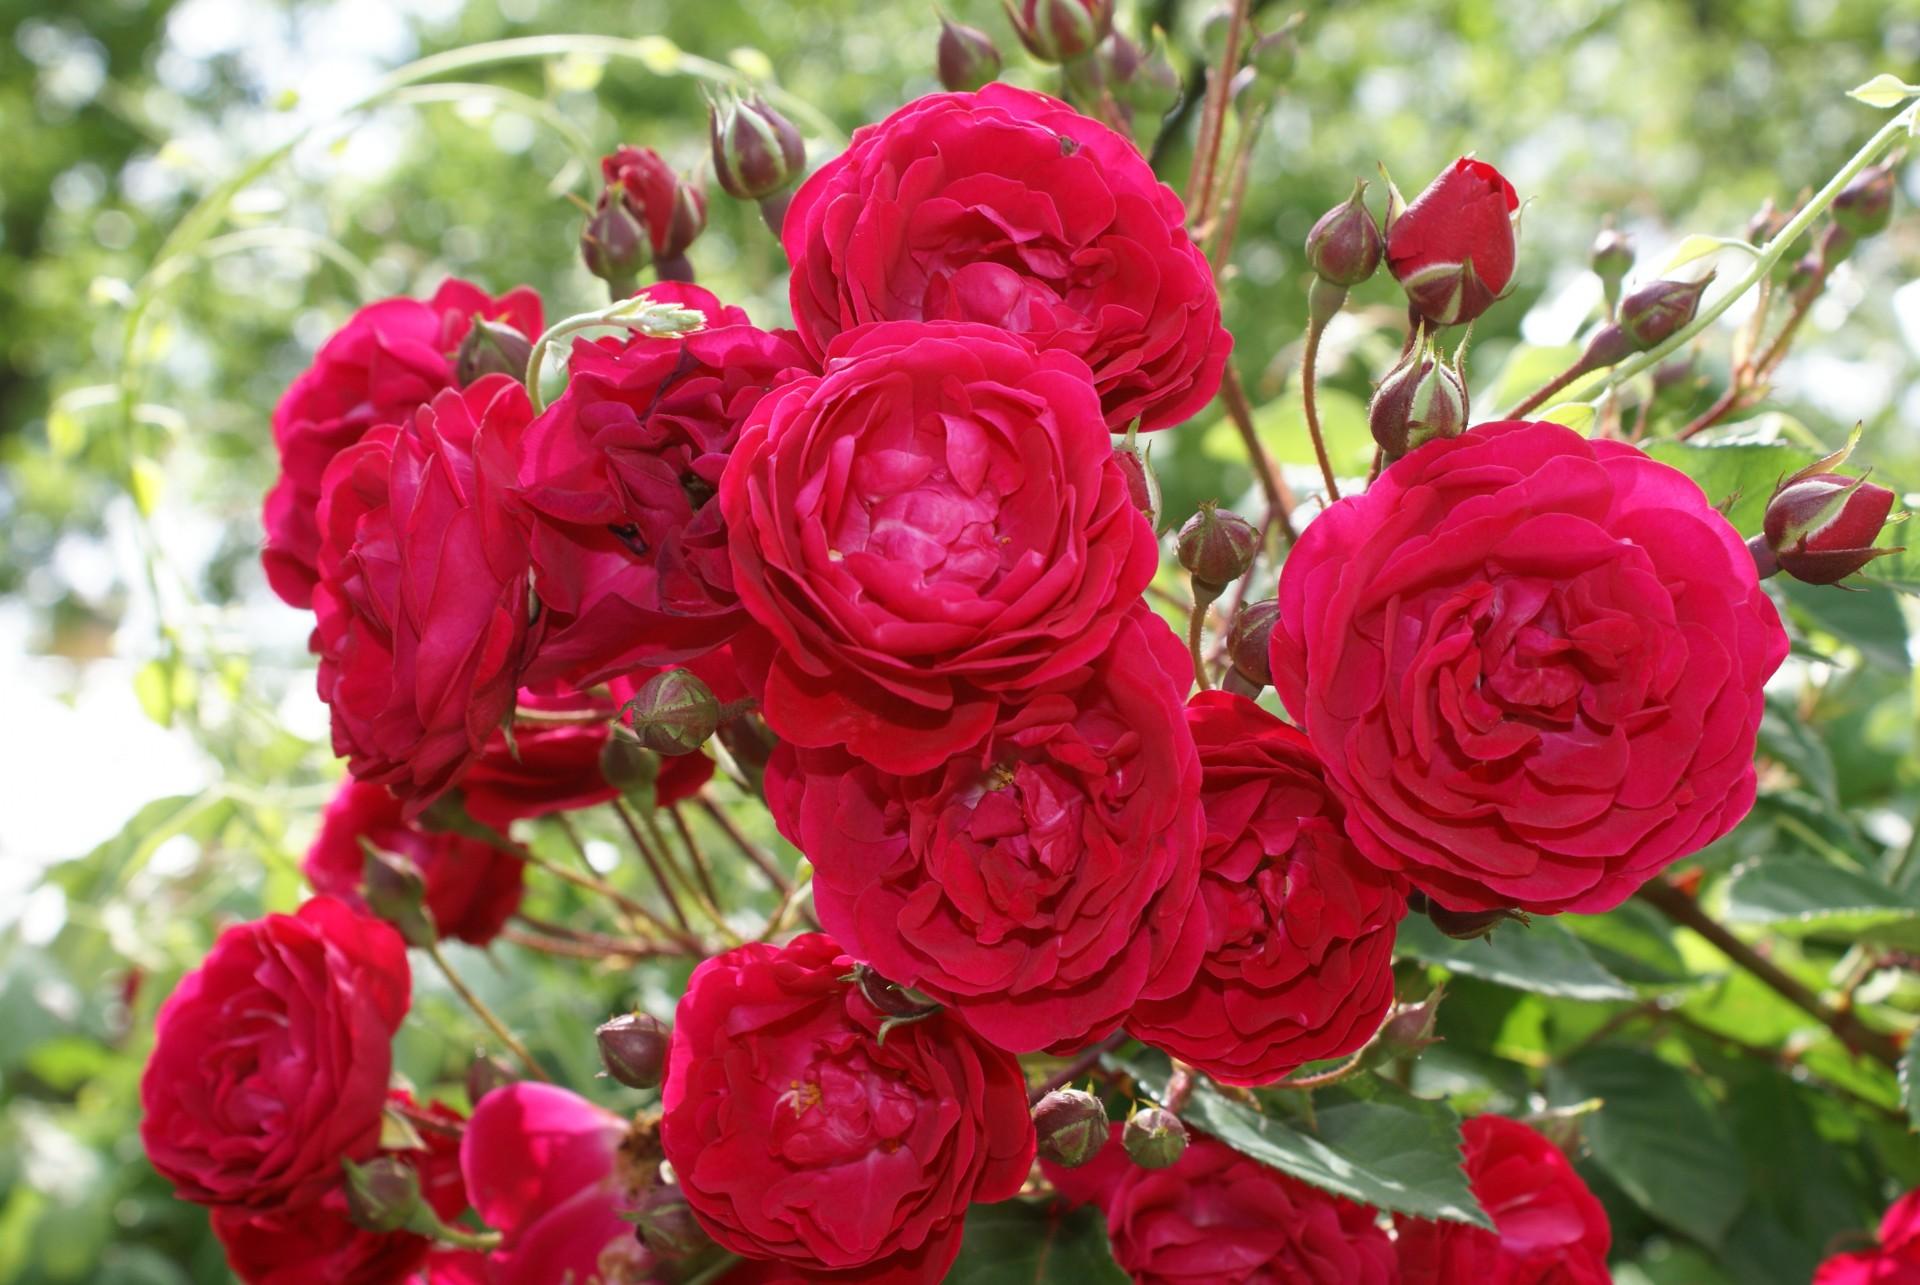 red-rose-bush_1521627003769.jpg